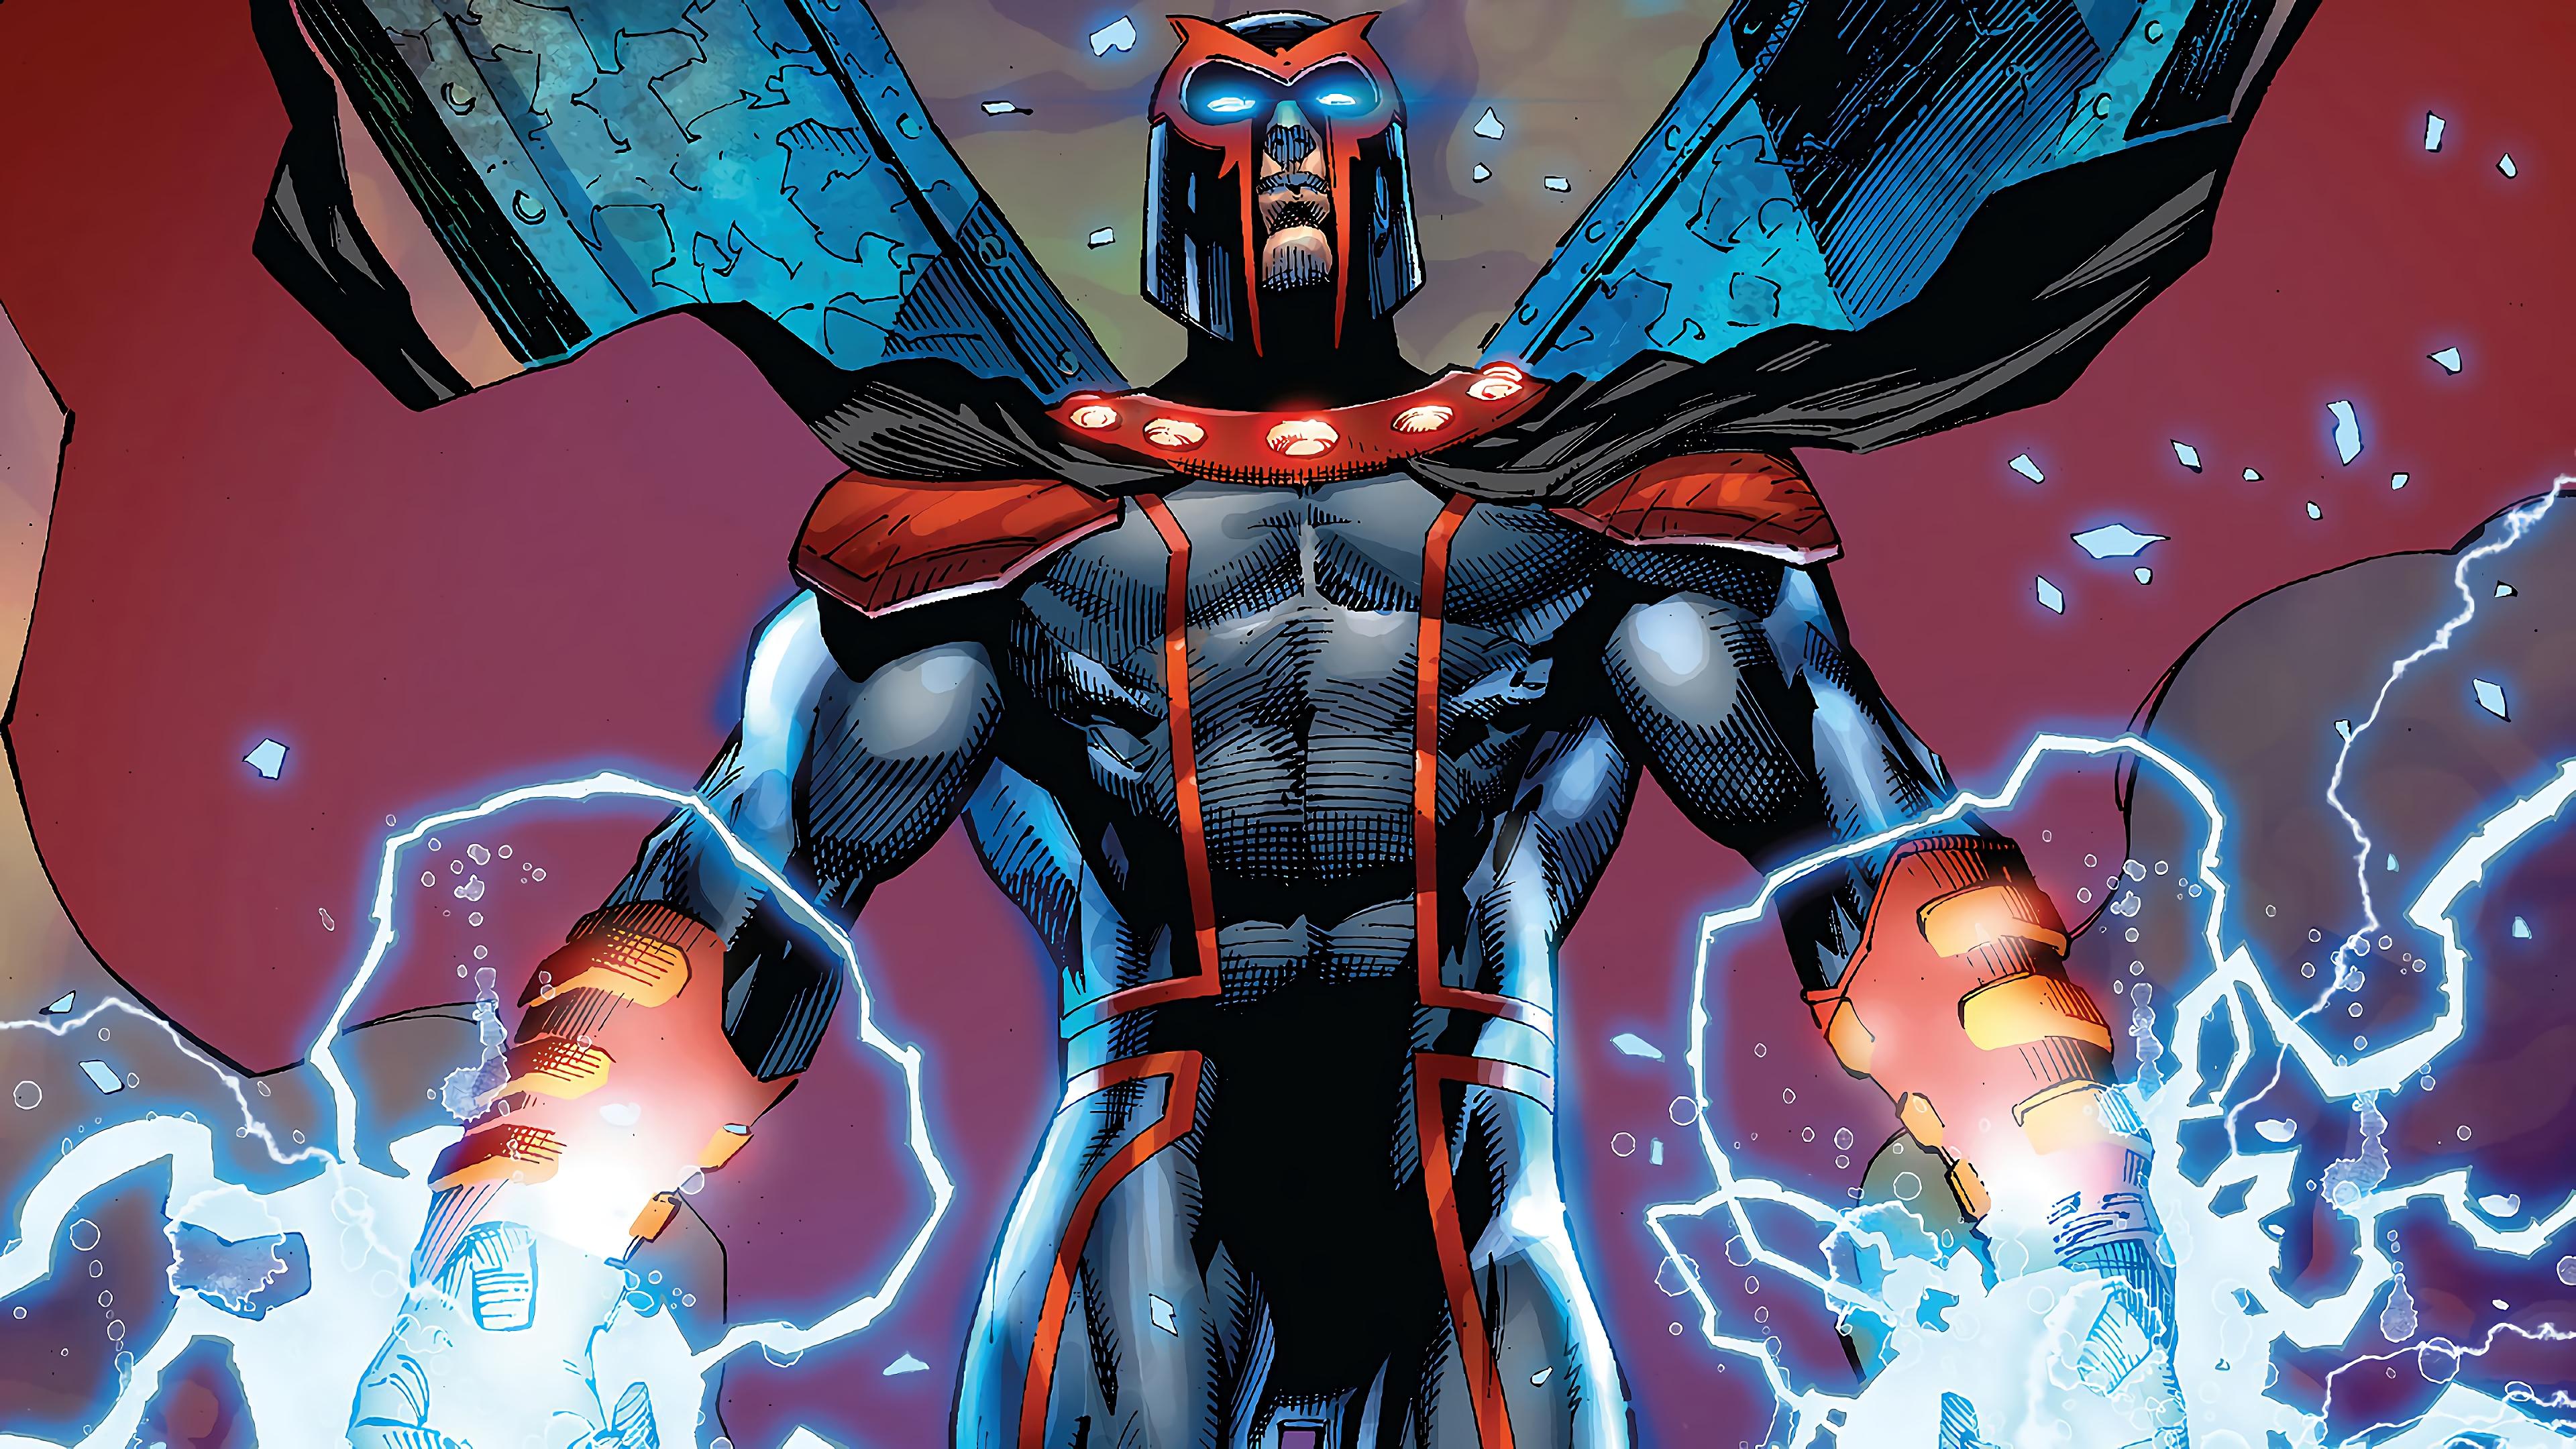 Magneto Marvel Comics 4K 4242 3840x2160